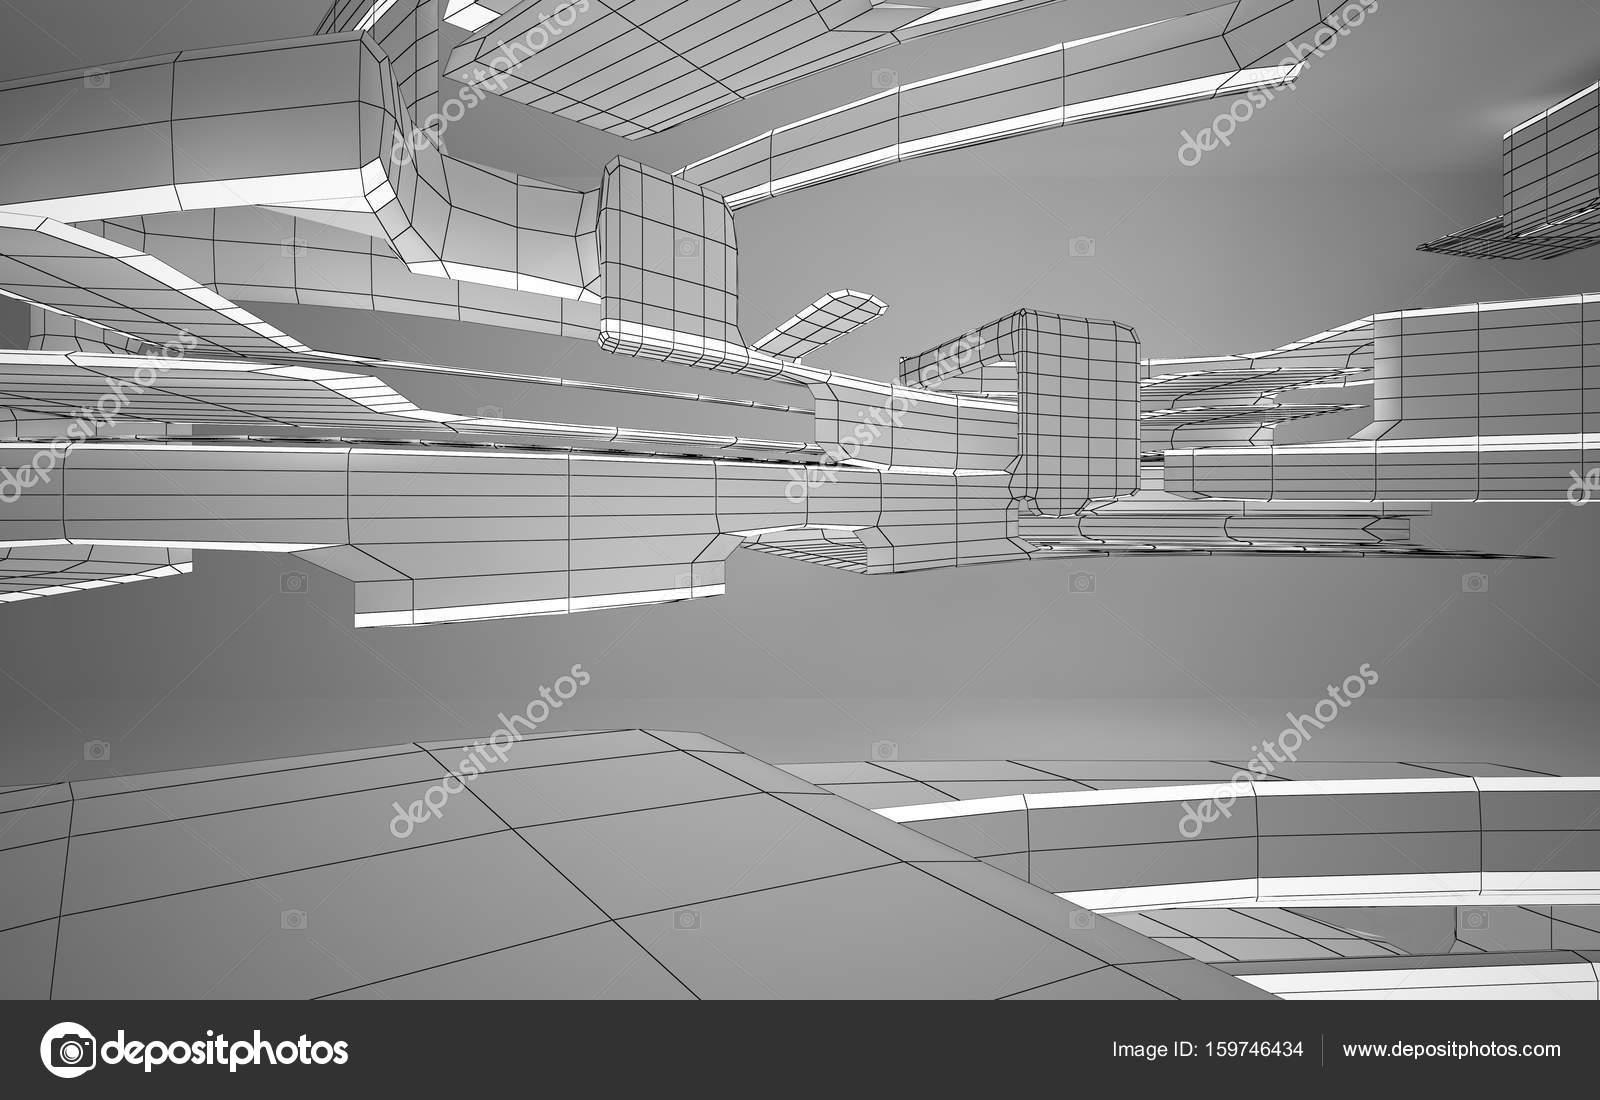 Beton In Interieur : Béton intérieur abstrait u2014 photographie sergeymansurov © #159746434